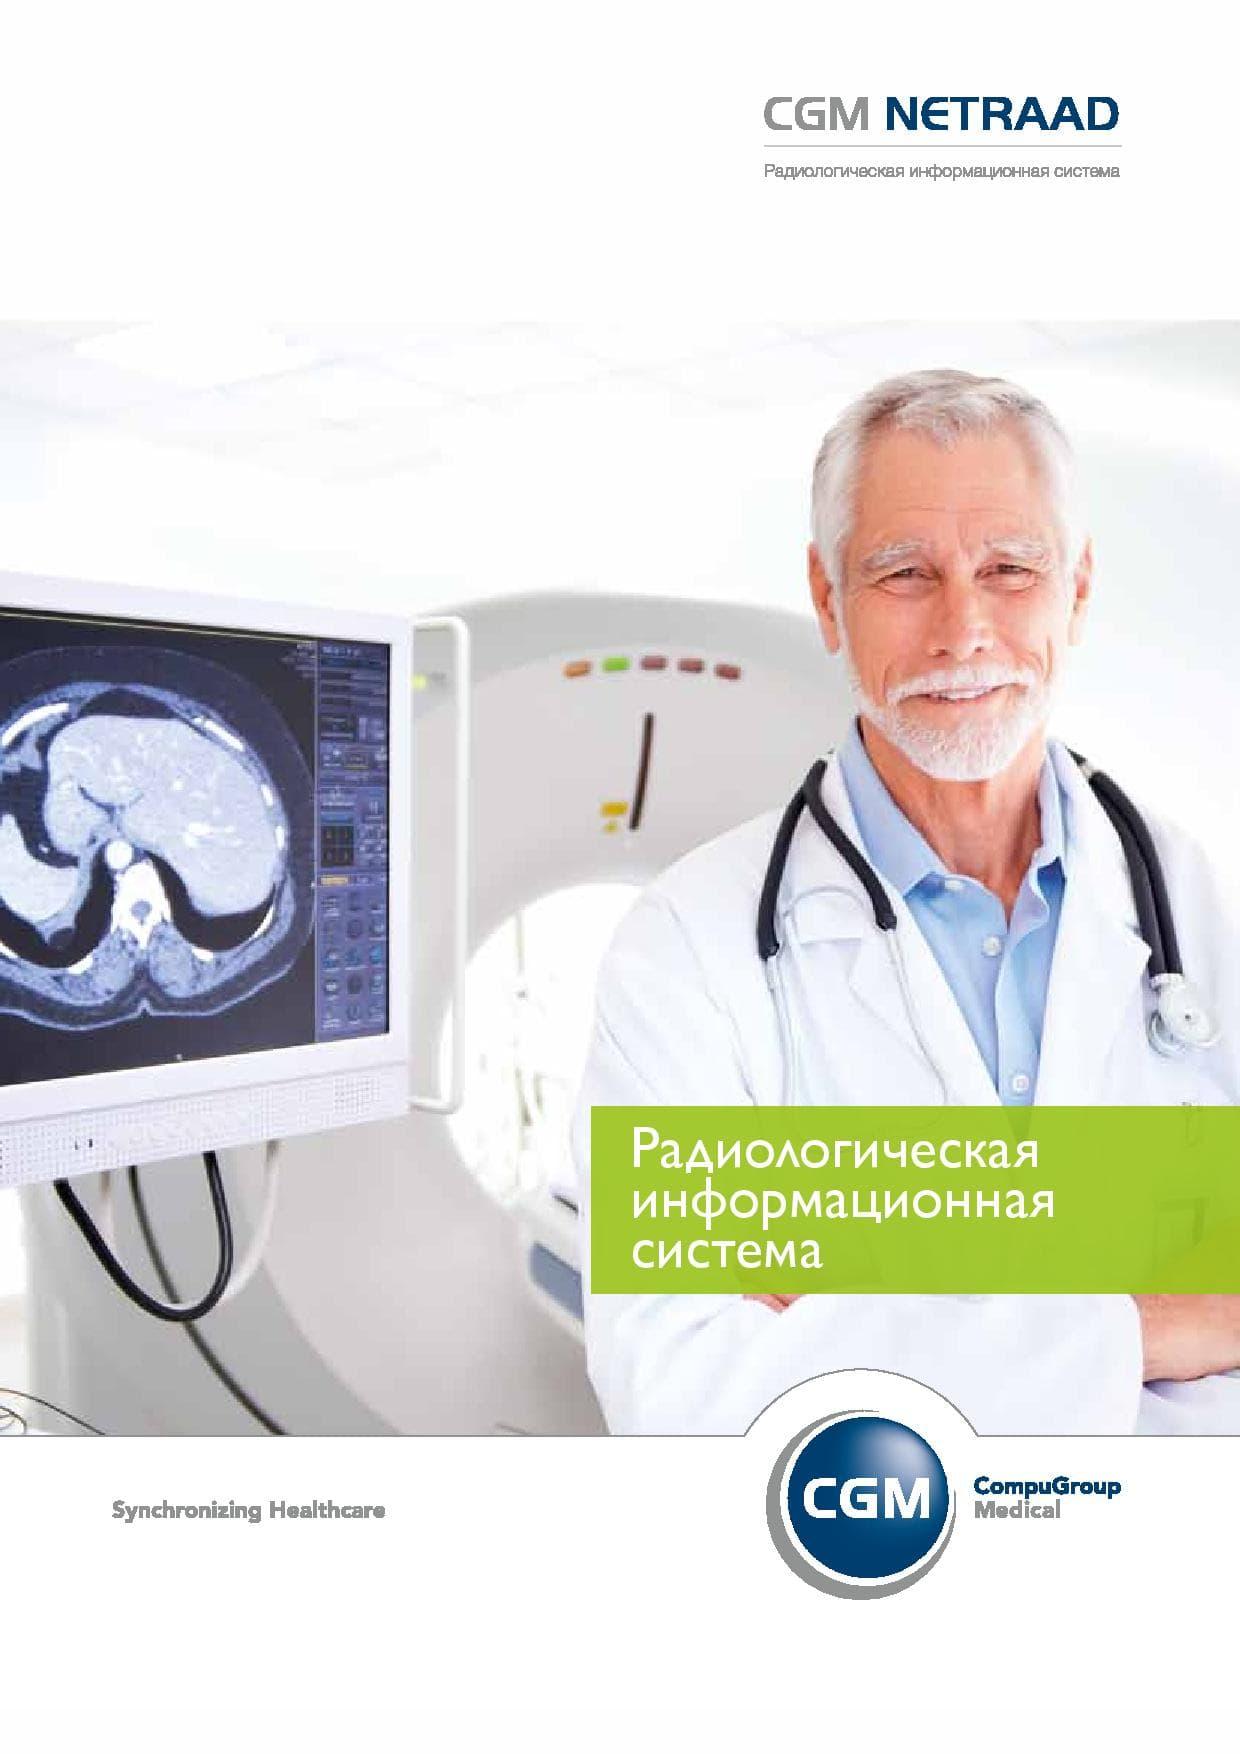 CGM_NETRAAD_RUS-page-001-min